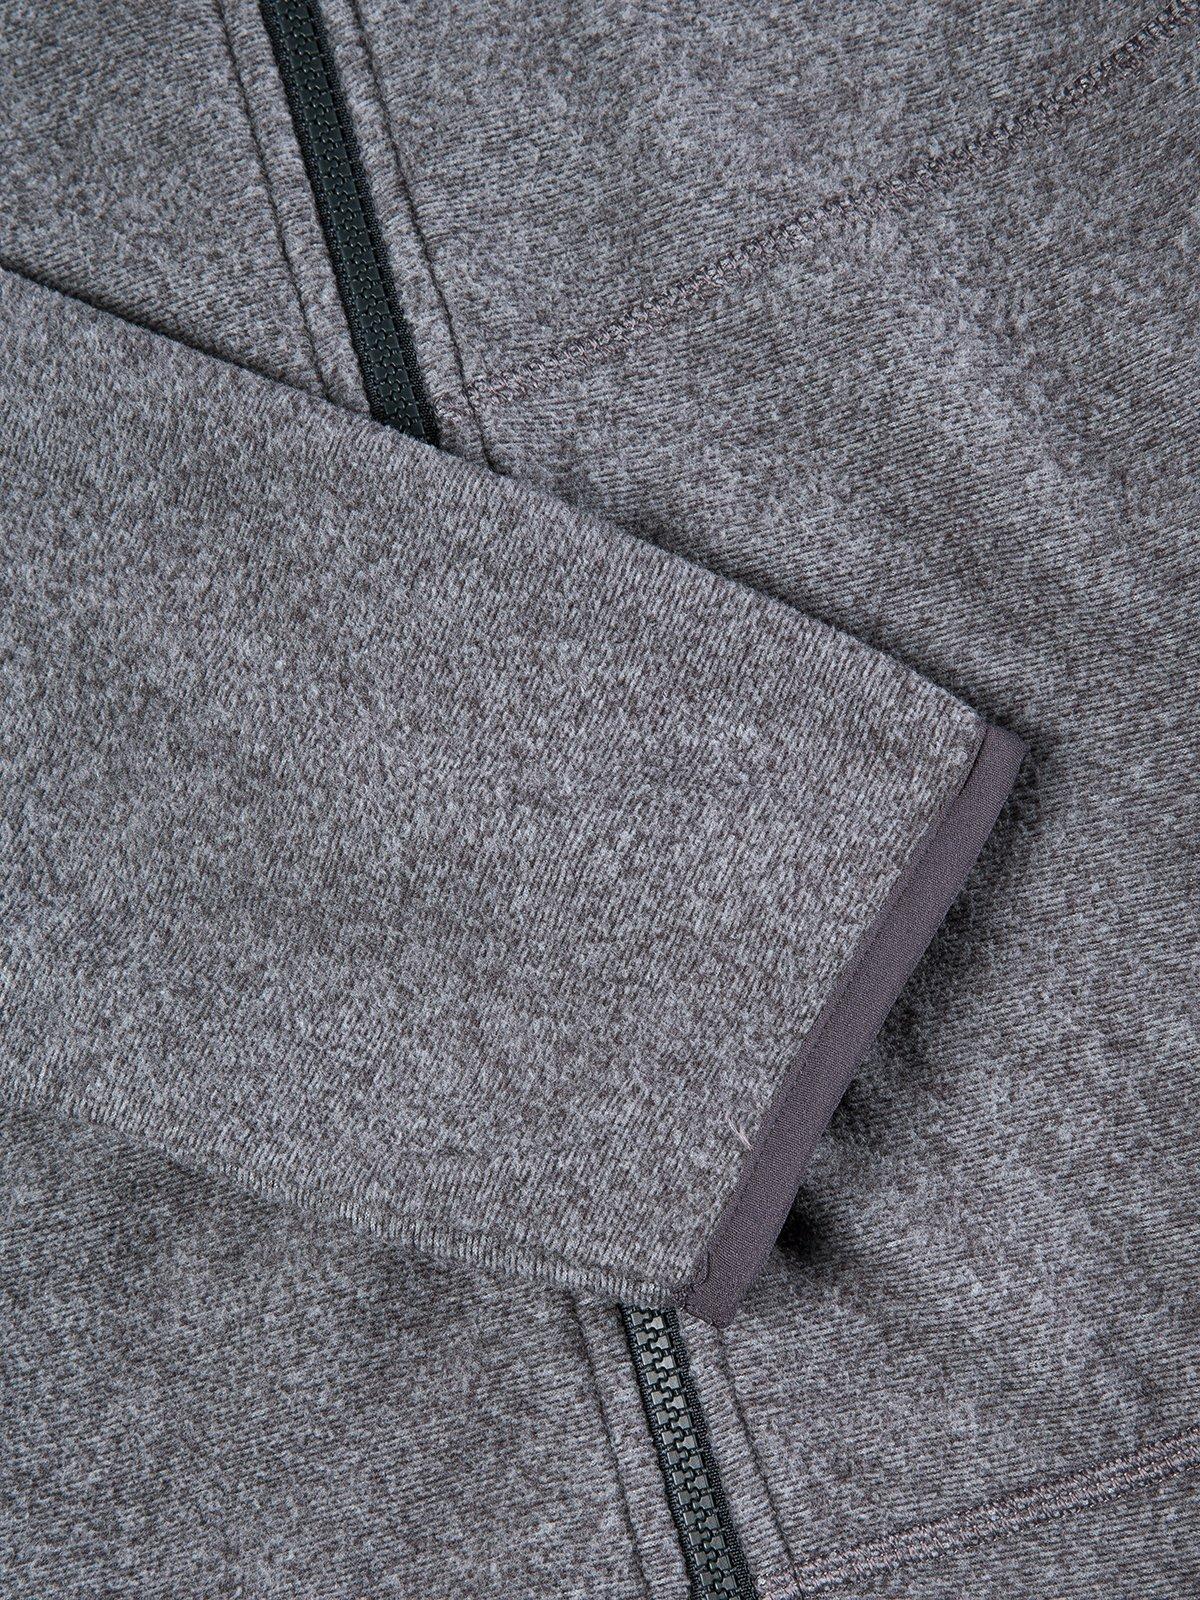 Berghaus Mens Spectrum Micro 2.0 Full Zip Fleece Jacket 6